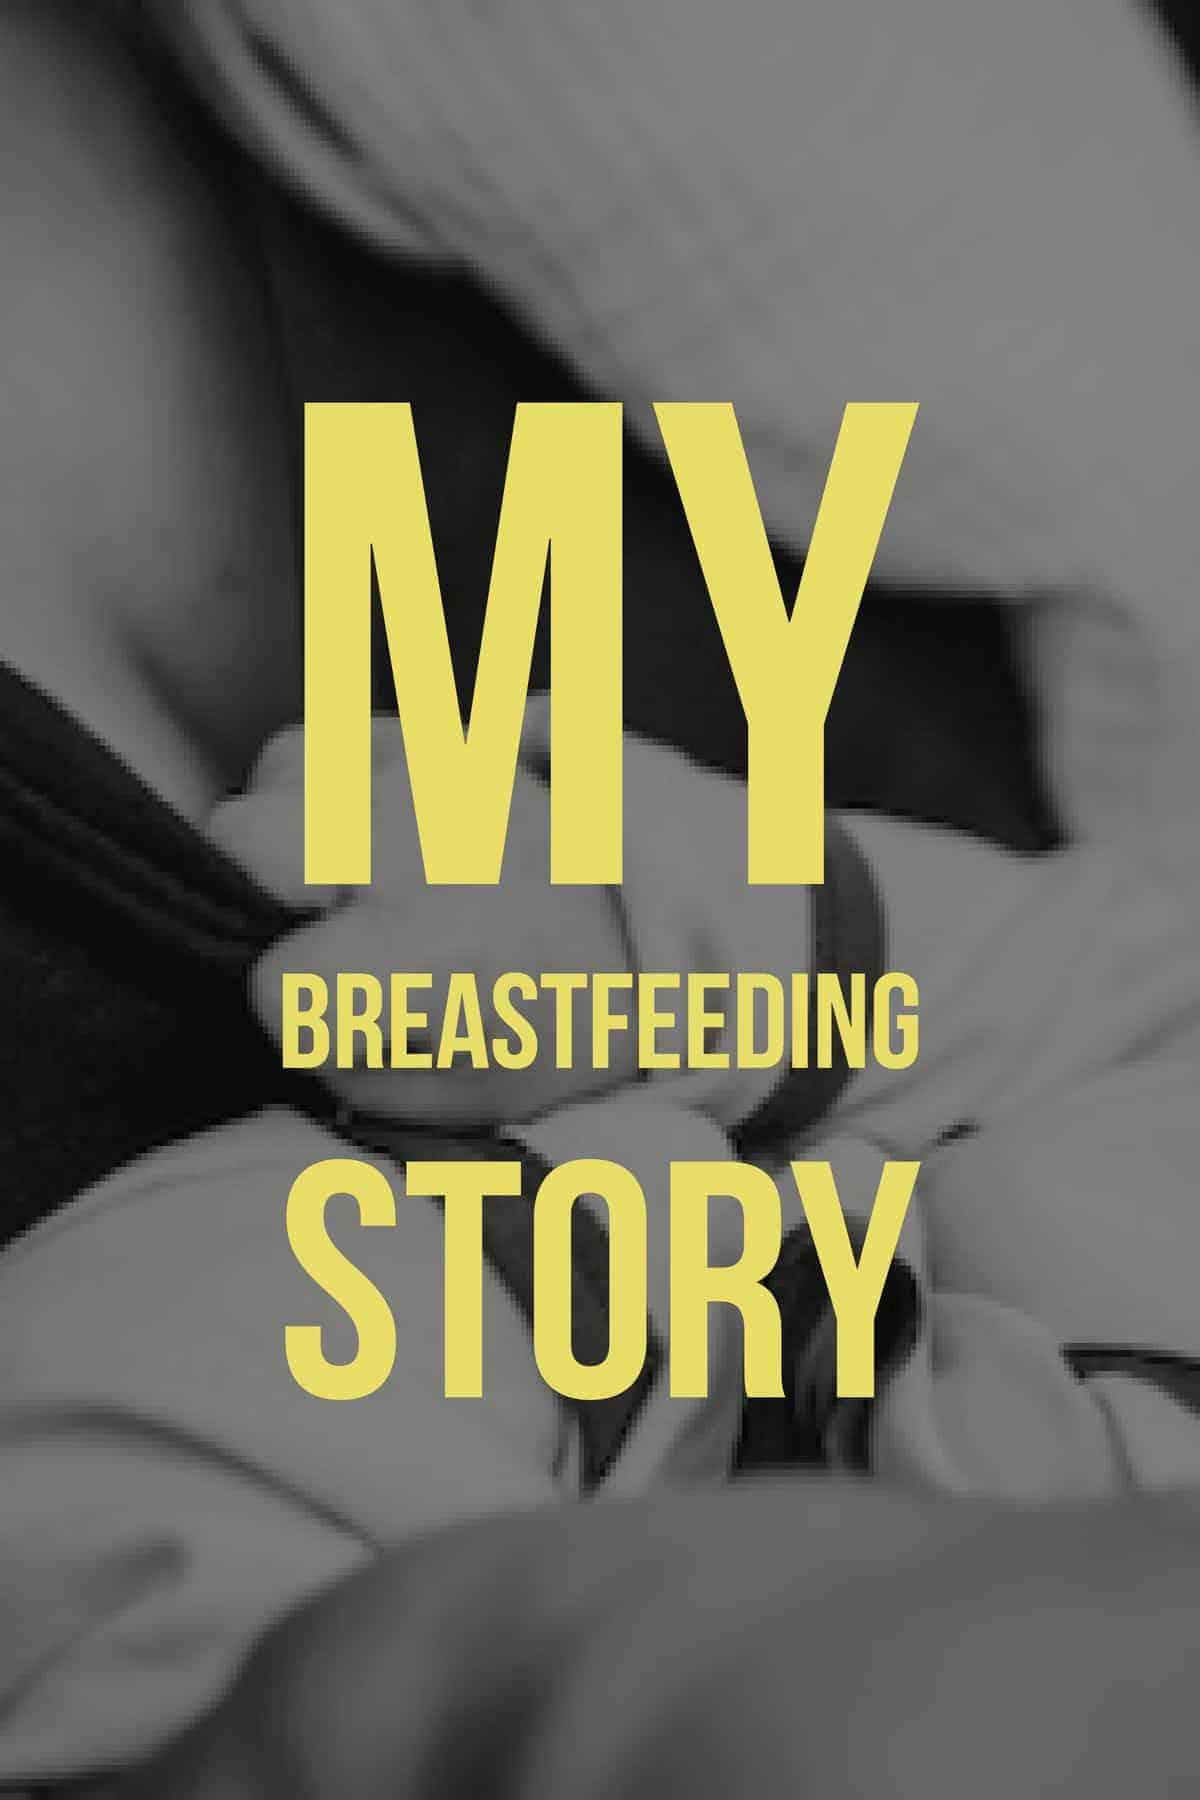 A Dietitian's breastfeeding story